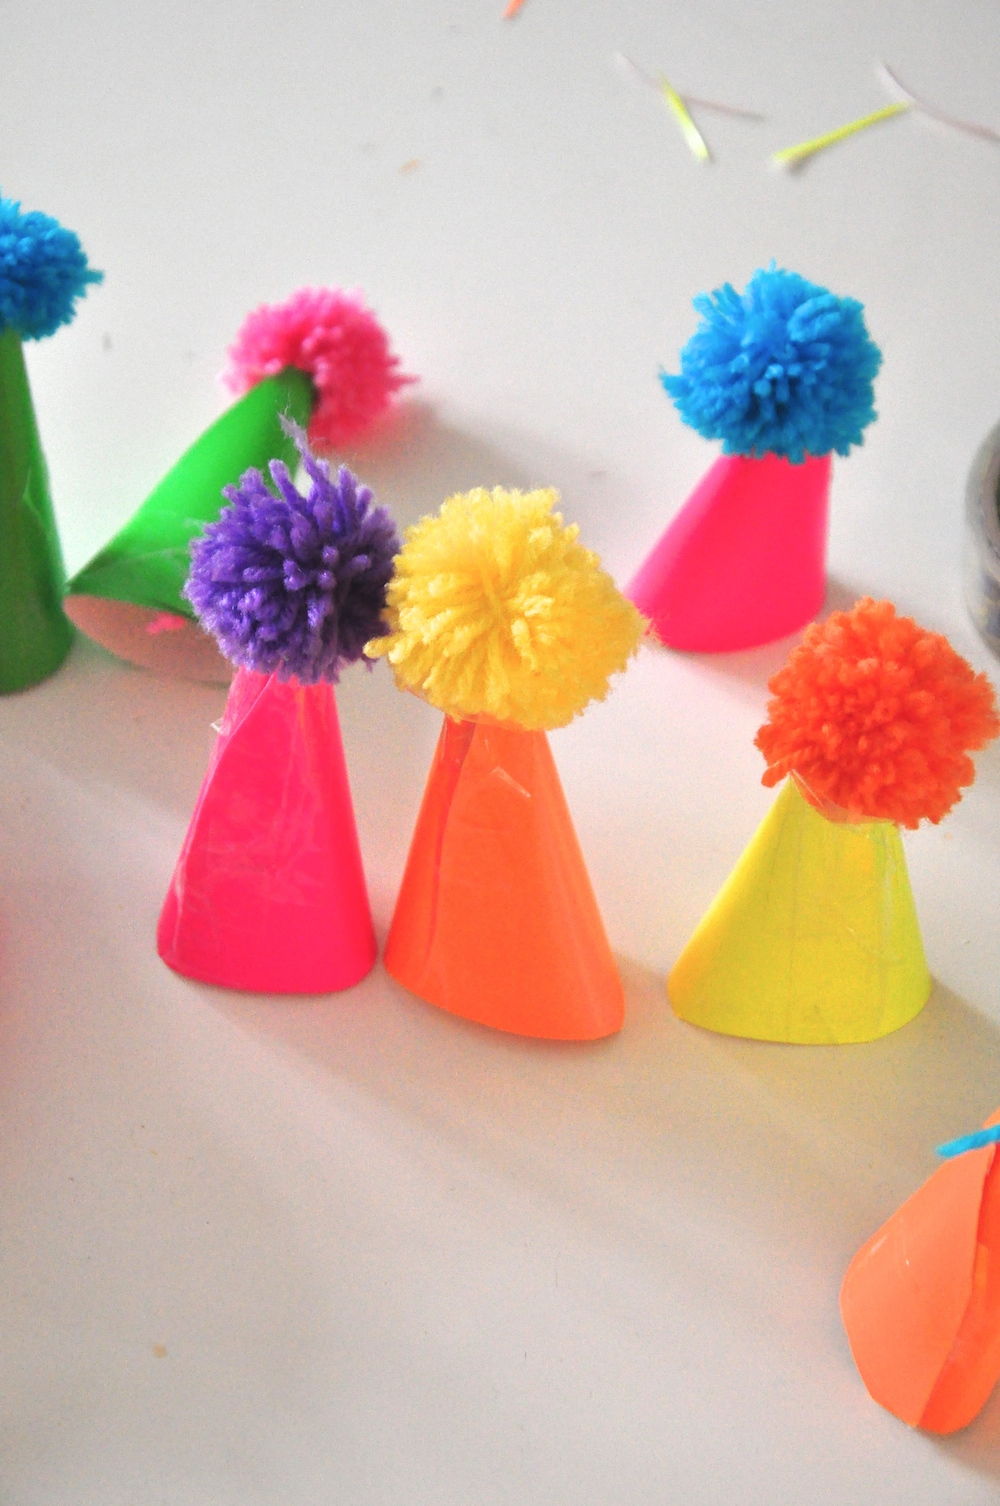 hats_pom_poms_party